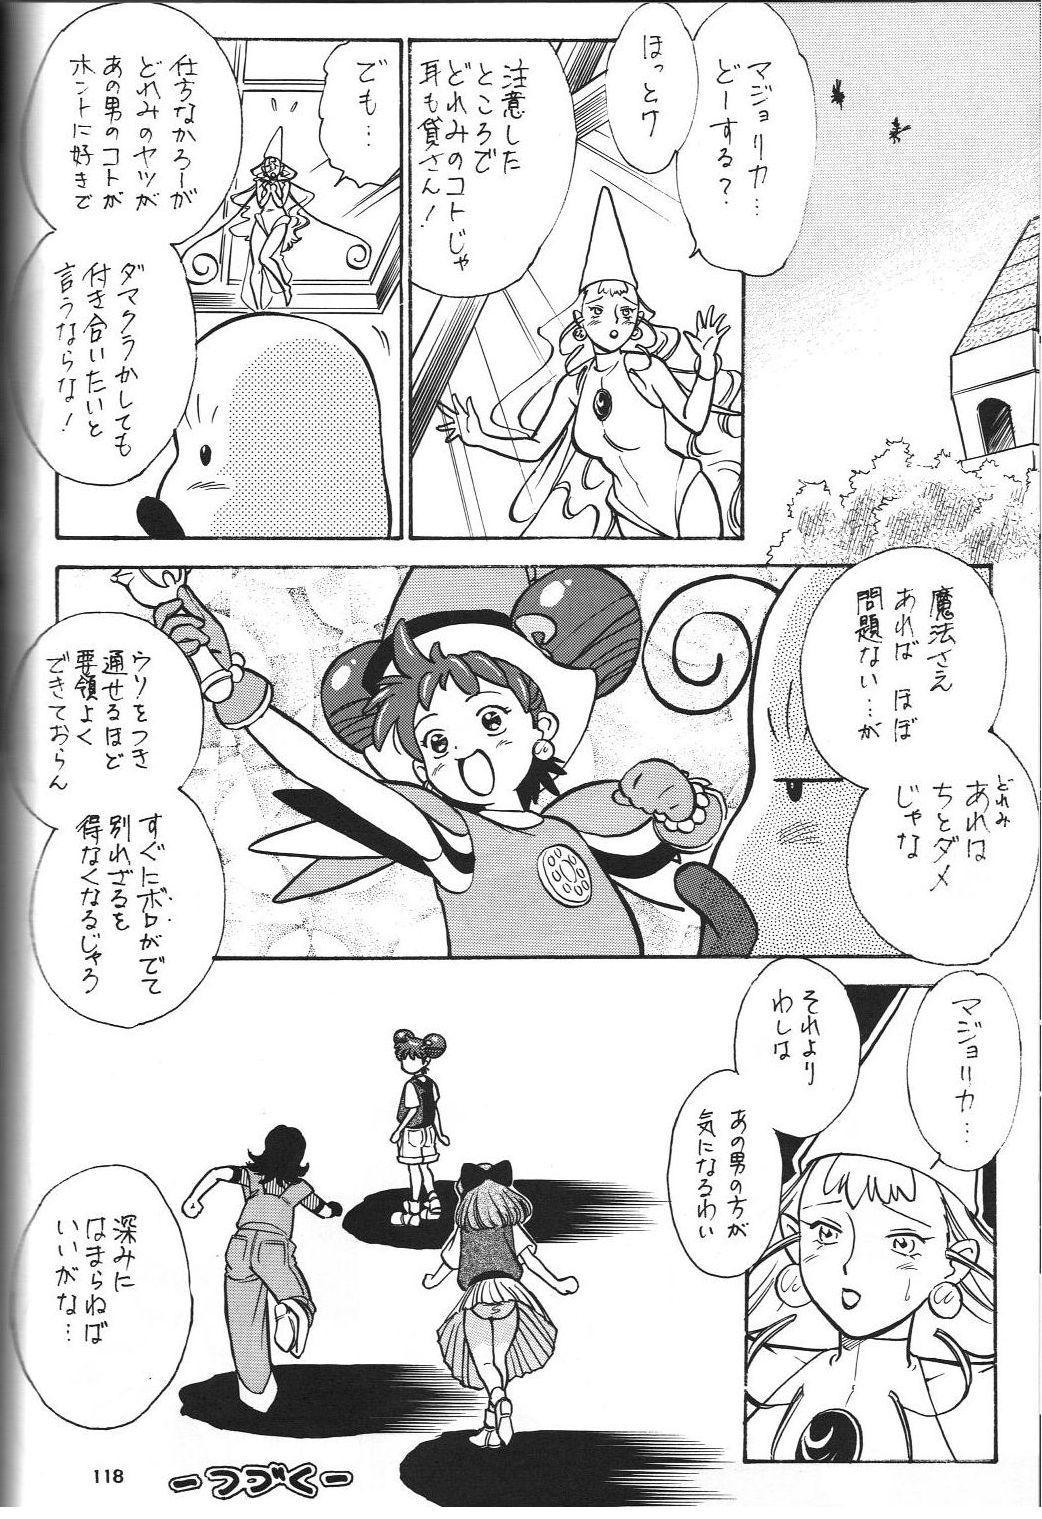 (C56) [Tsurikichi Doumei (Various)] Sengoku Rock - Nan Demo-R (Various) 119